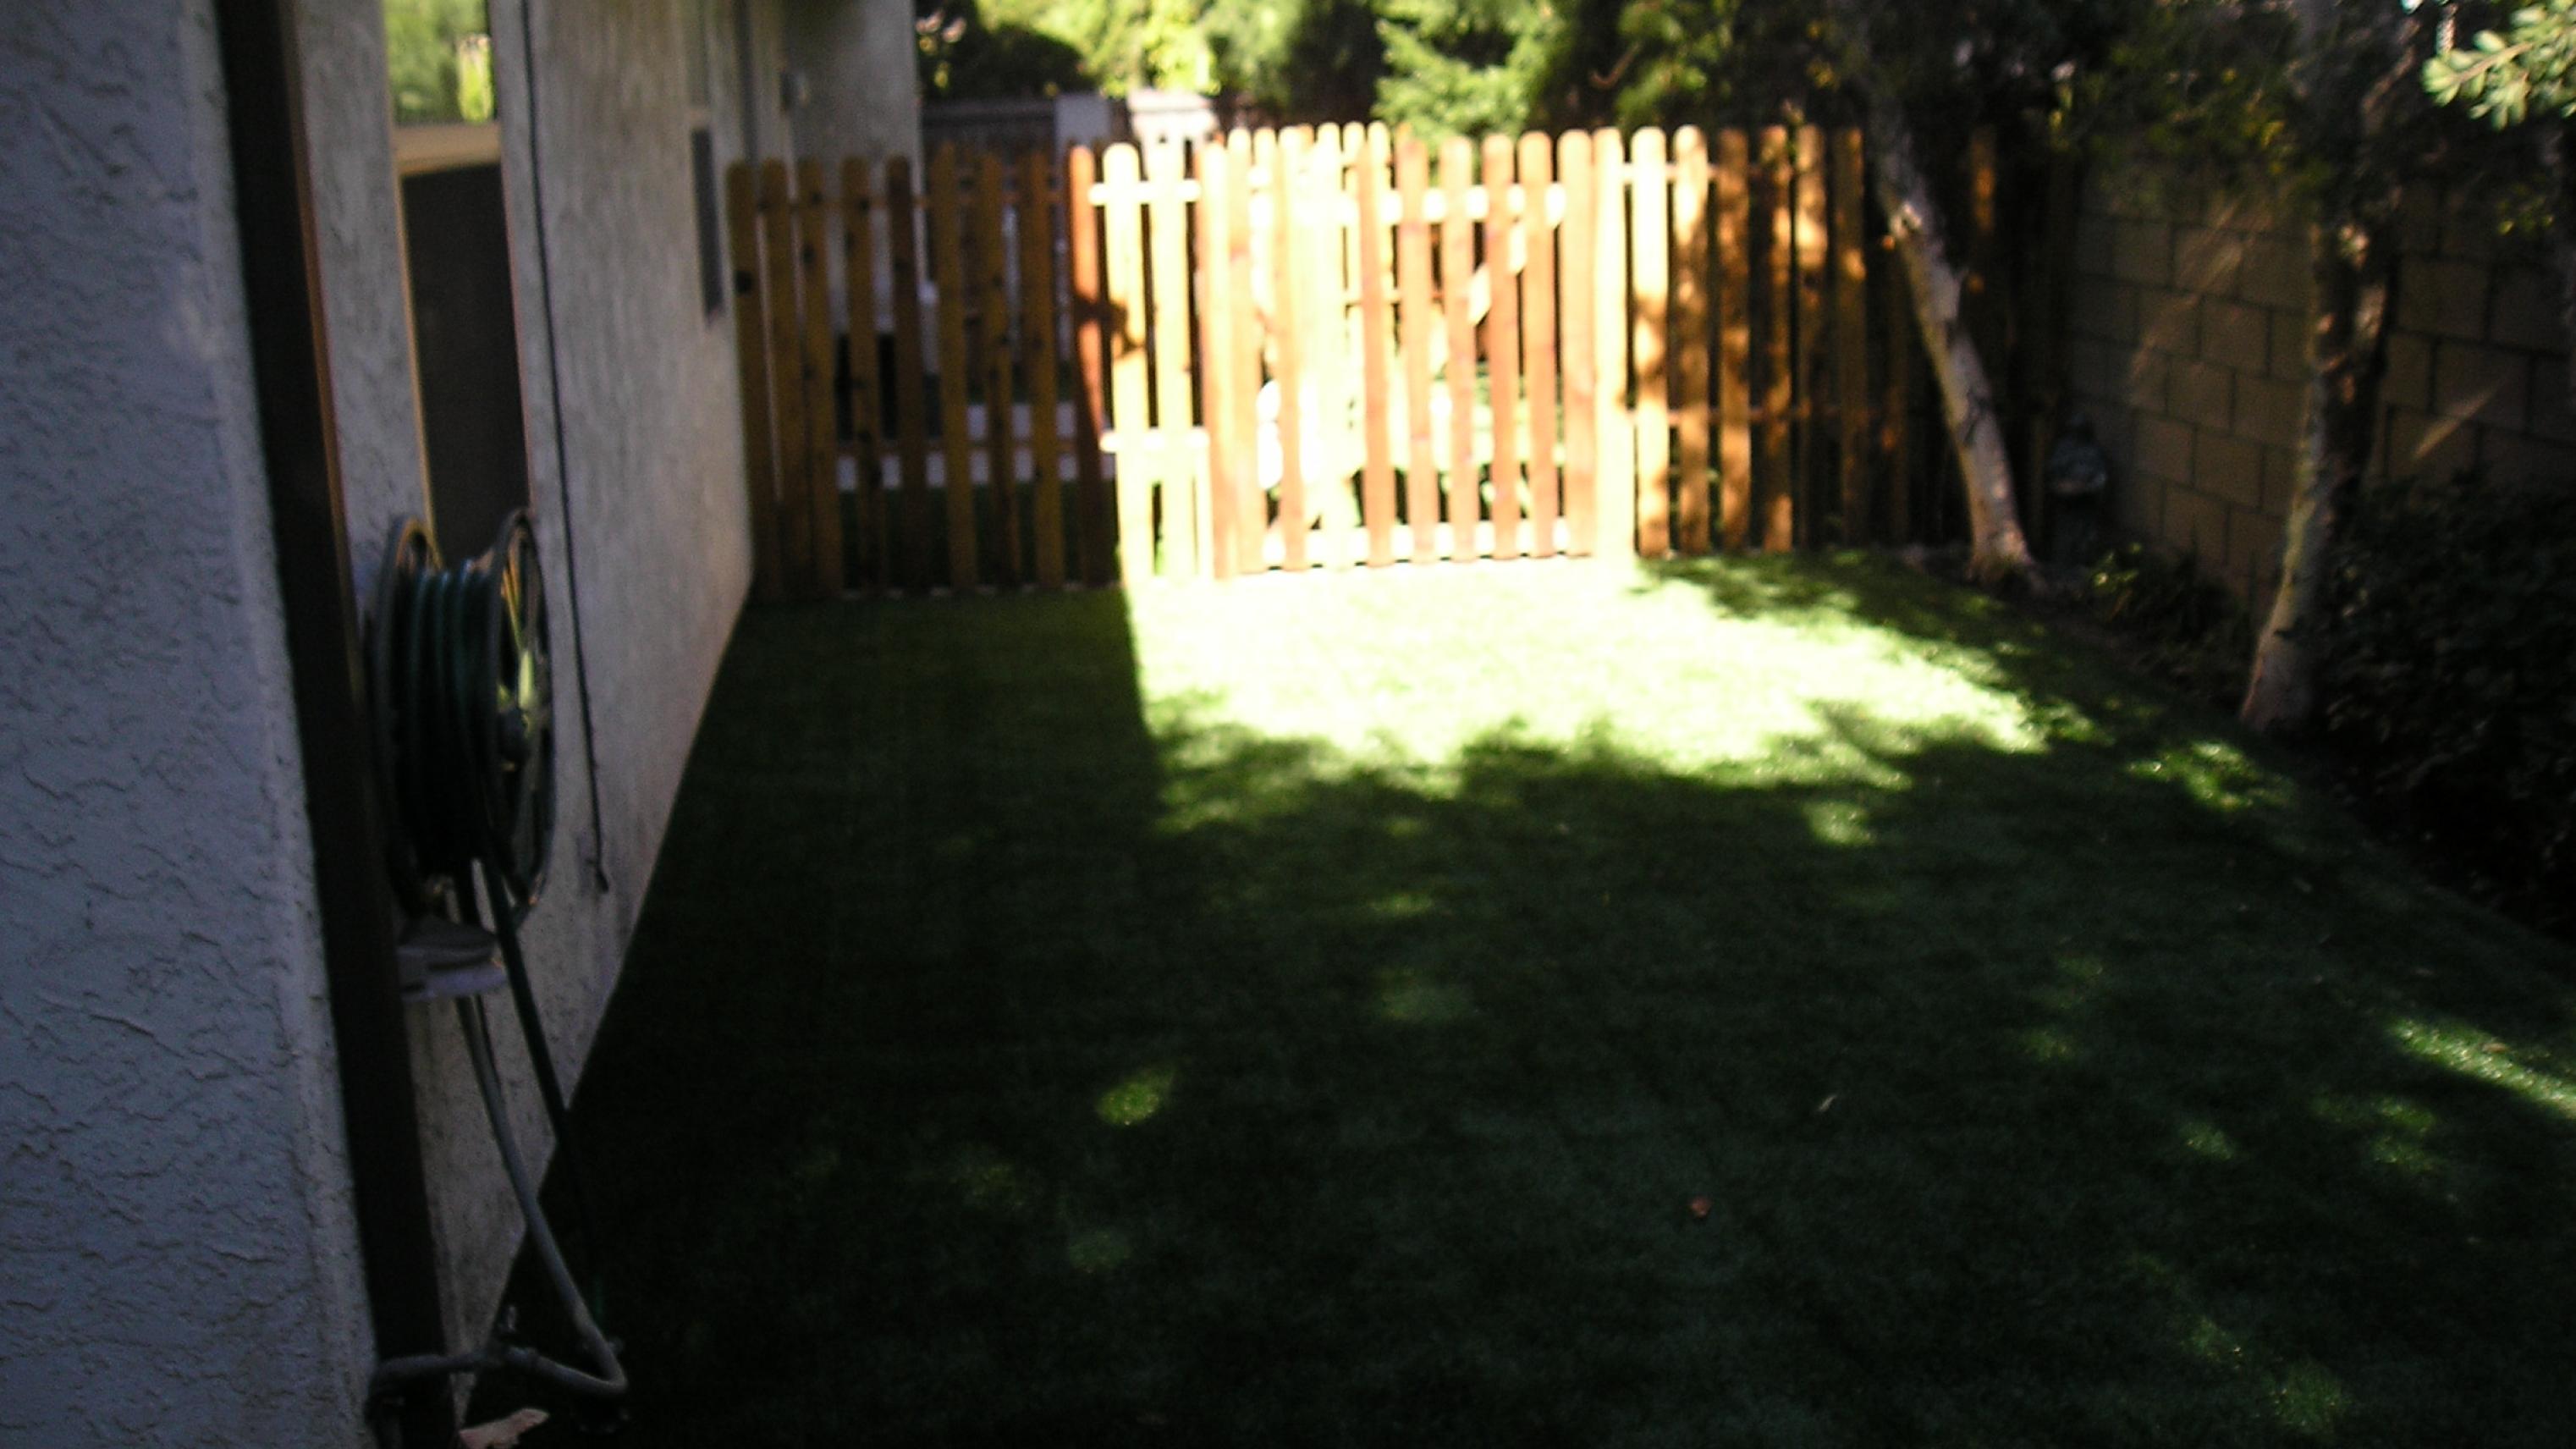 Super Natural 60 backyard turf,turf backyard,fake grass for backyard,fake grass backyard,artificial grass backyard,fake grass for yard,backyard turf,turf backyard,turf yard,fake grass for backyard